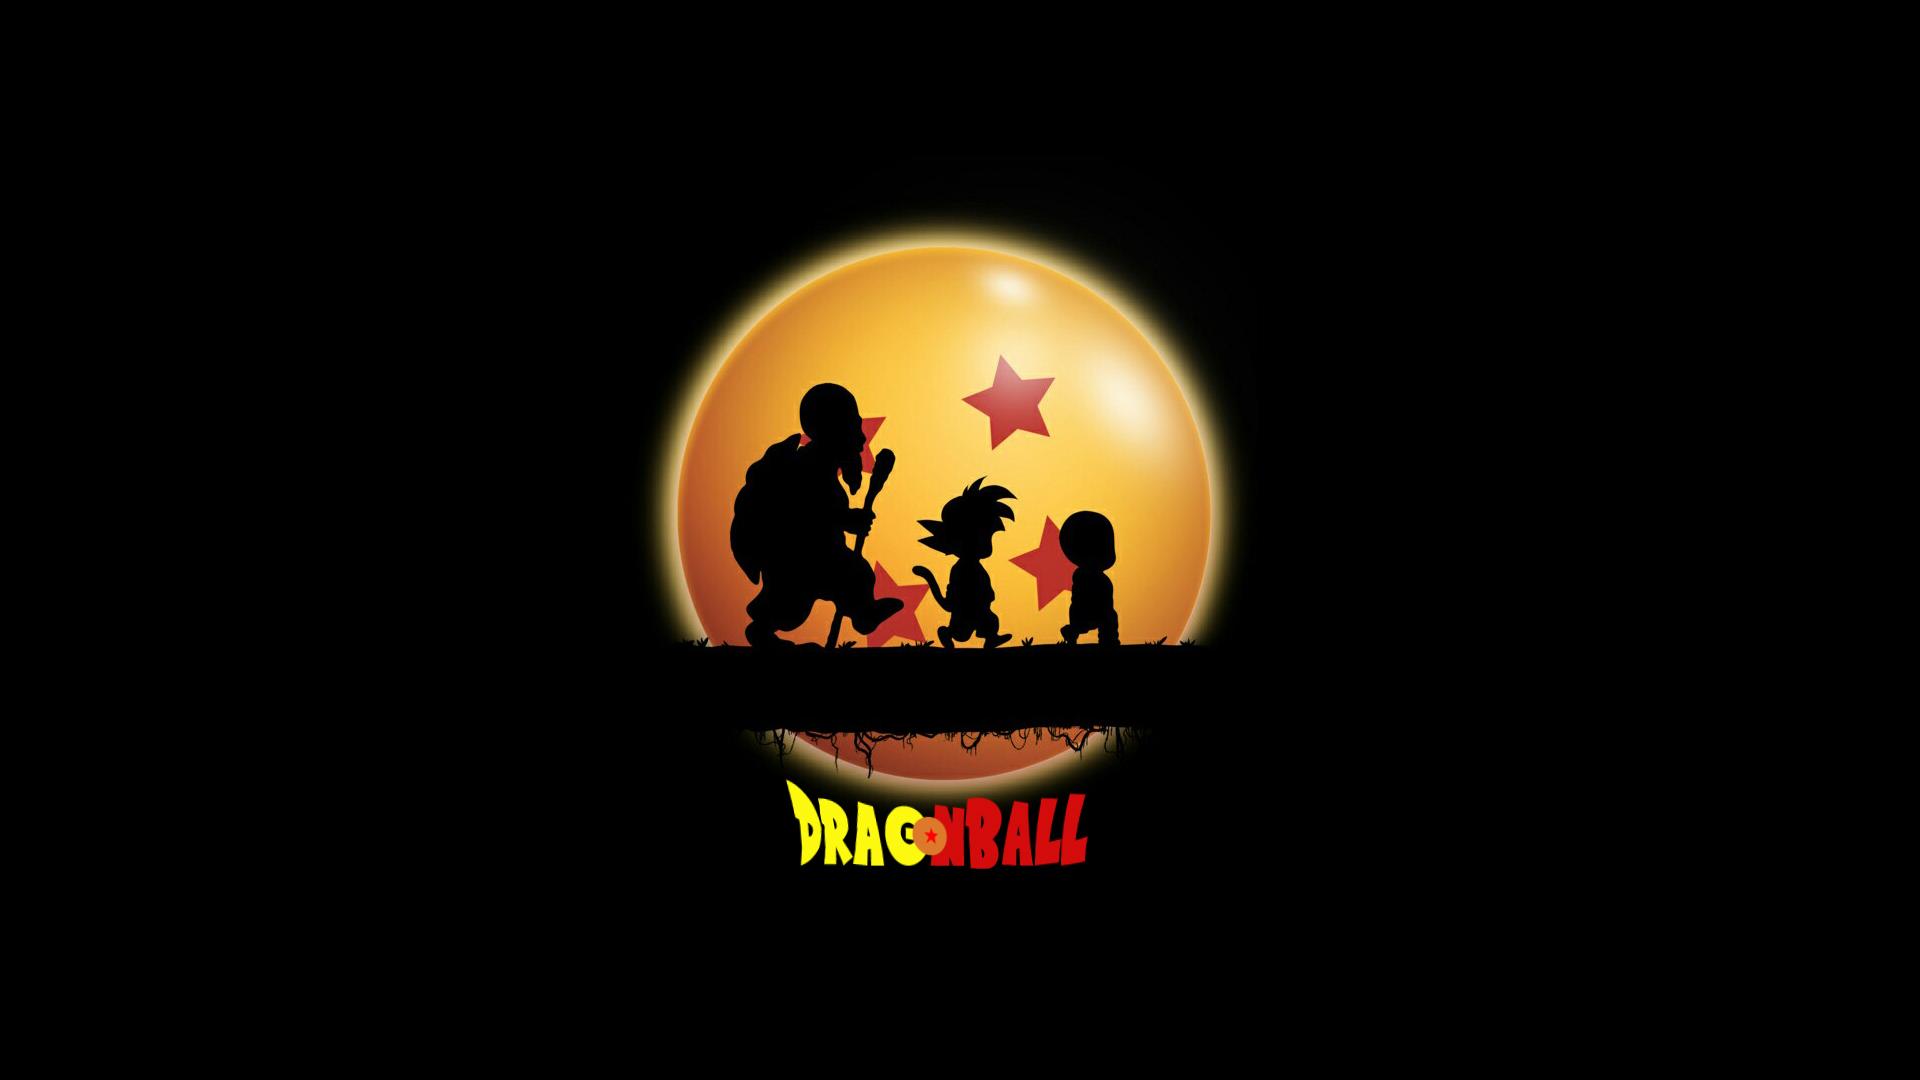 Wallpaper Dragon Ball Sangoku Krillin 1920x1080